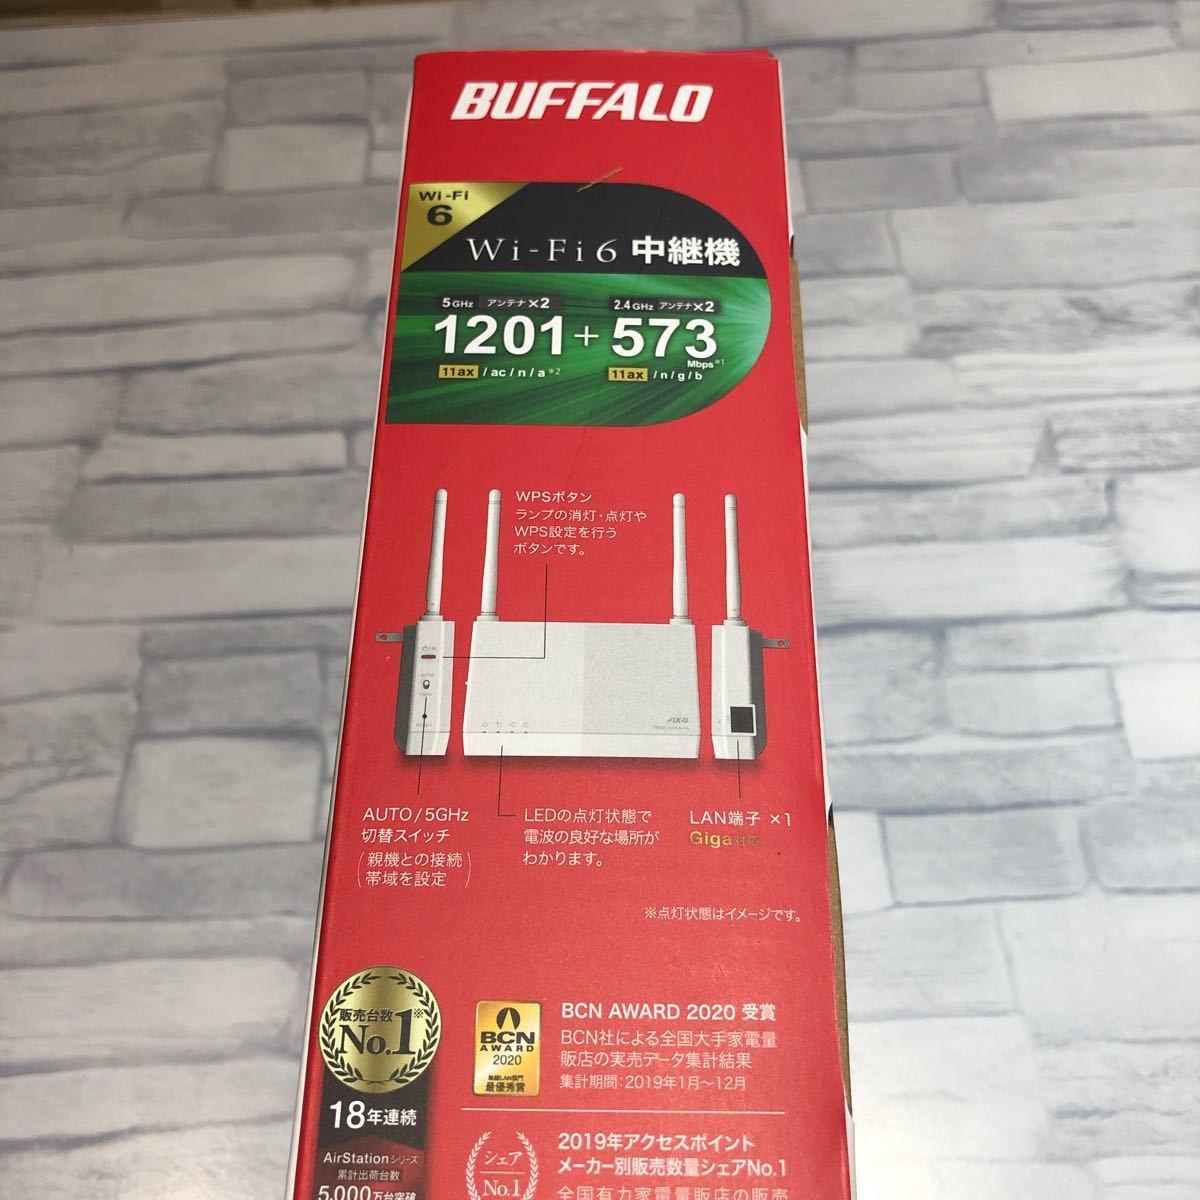 BUFFALO 無線LAN中継機 11ax/ac/n/g/b 1201+573Mbps WEX-1800AX4EA バッファロー